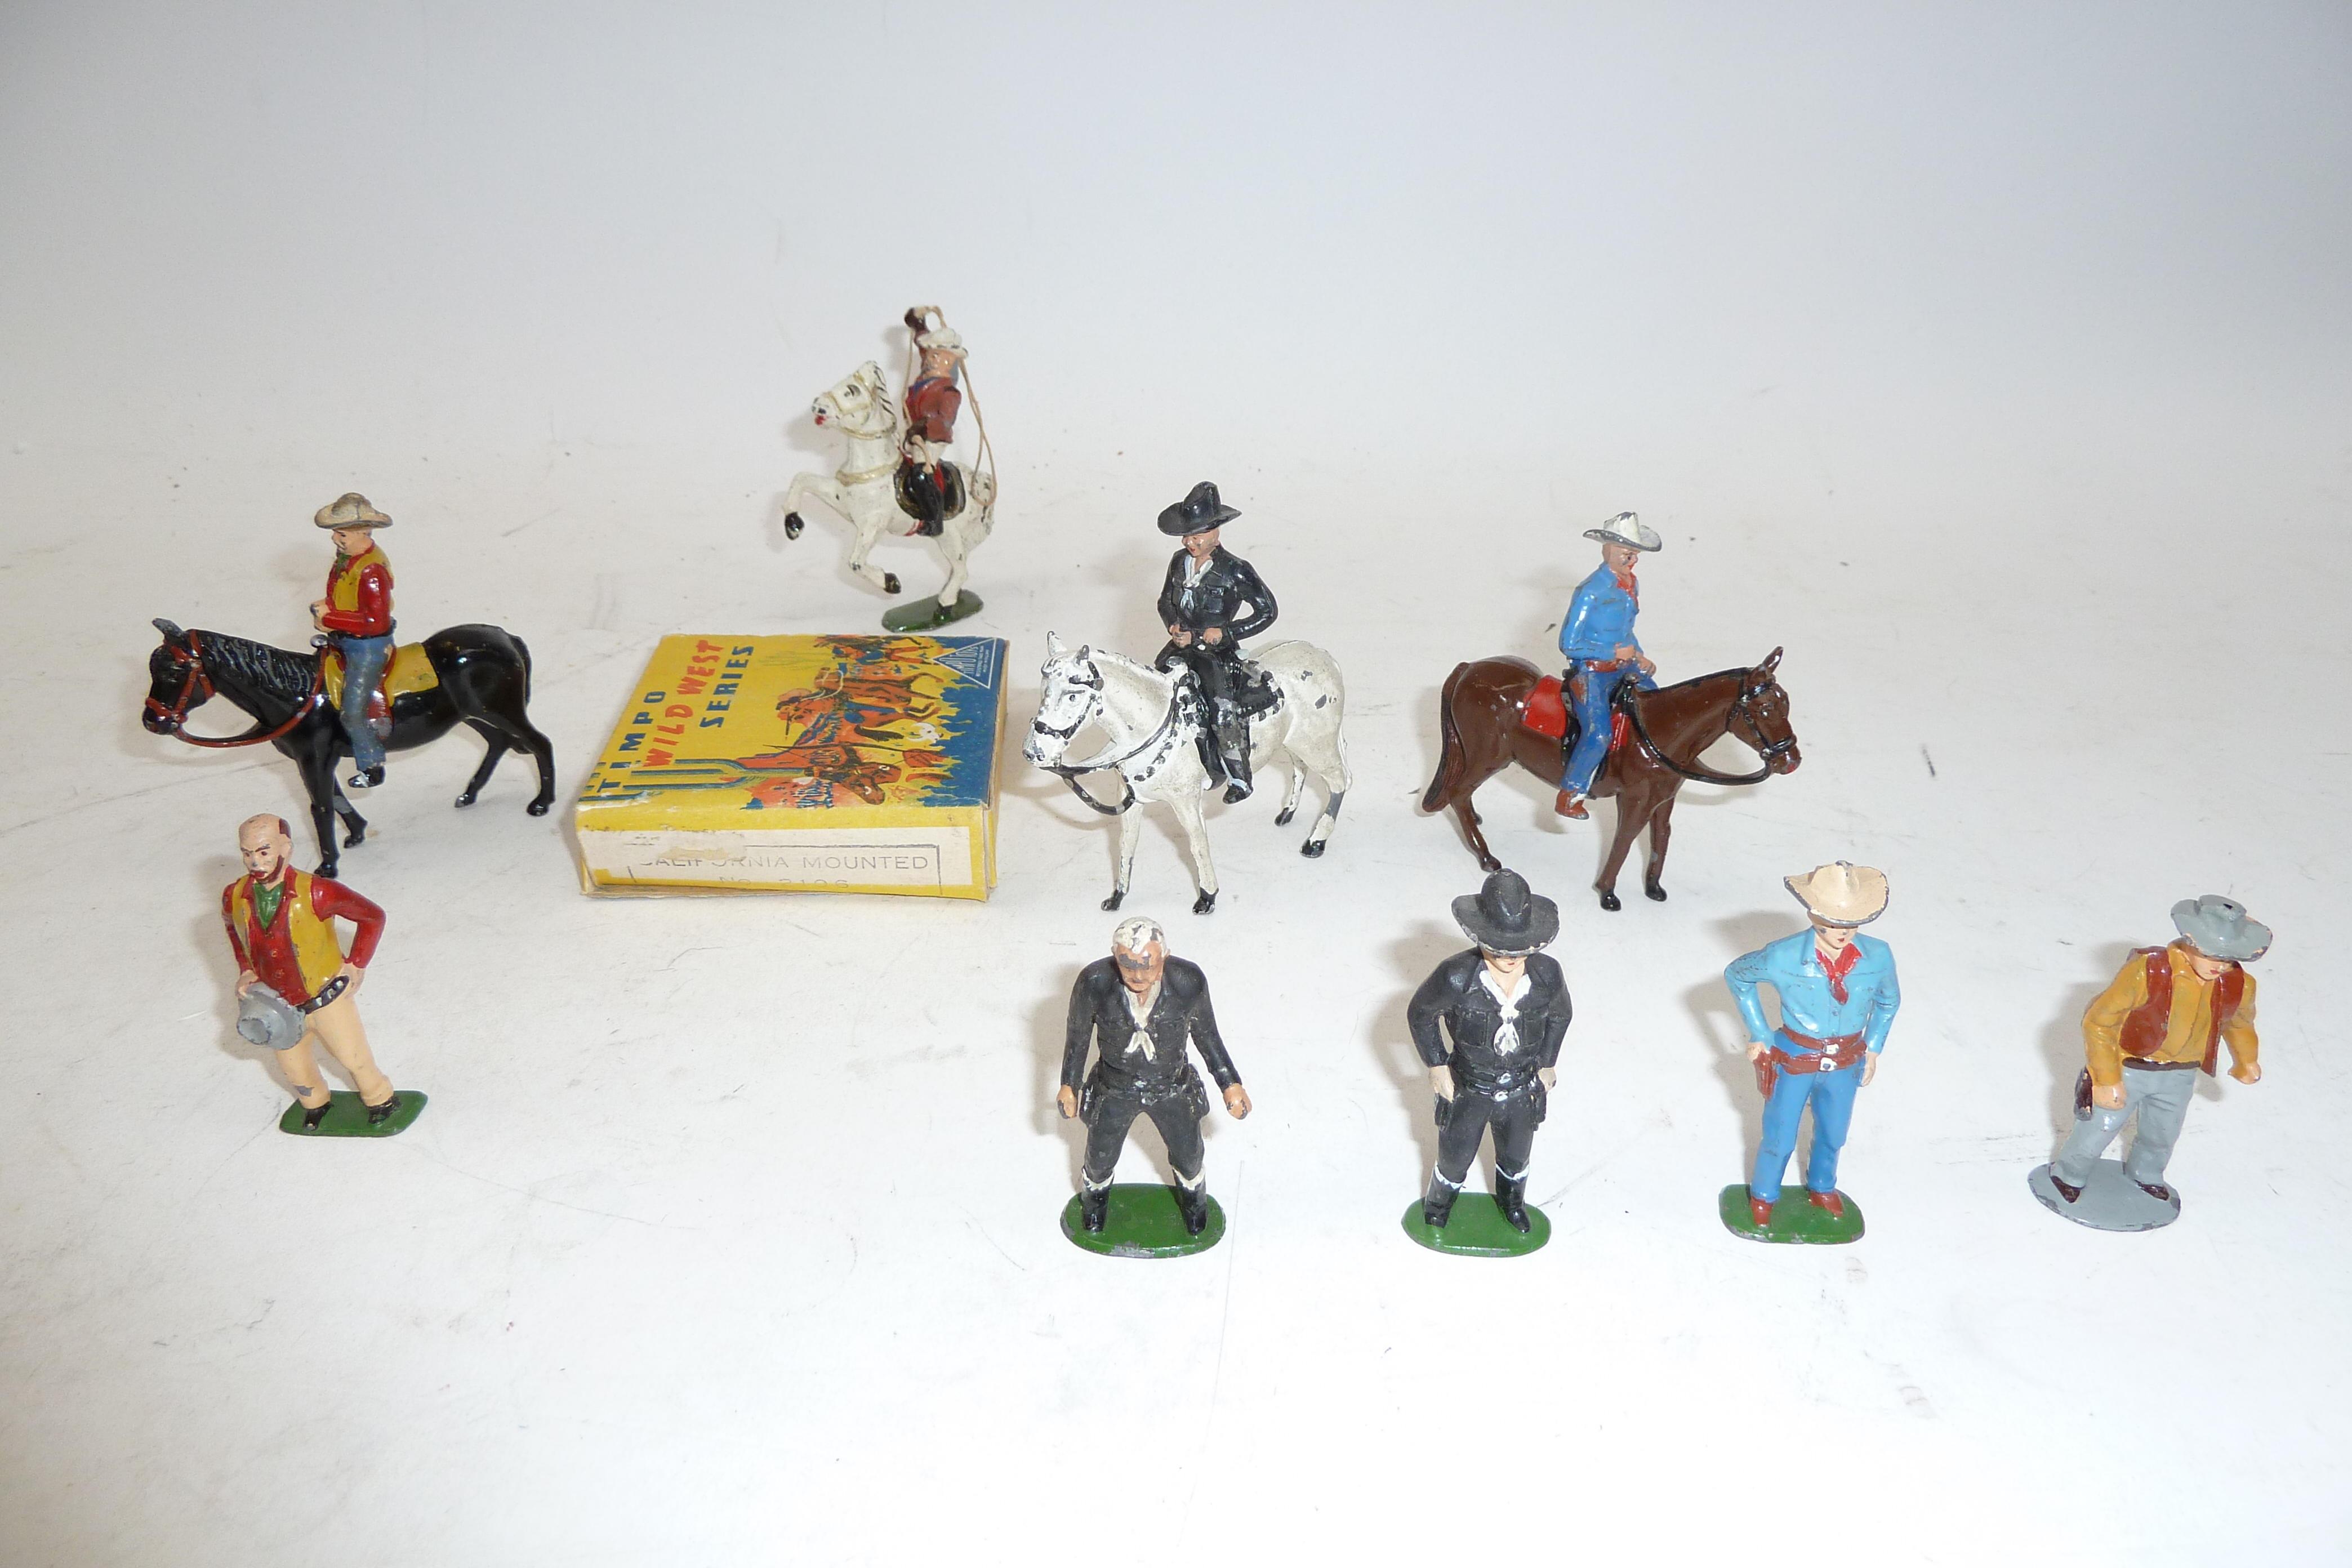 Auktion - Fine Dolls and Teddy Bear am 23 05 2012 - LotSearch de